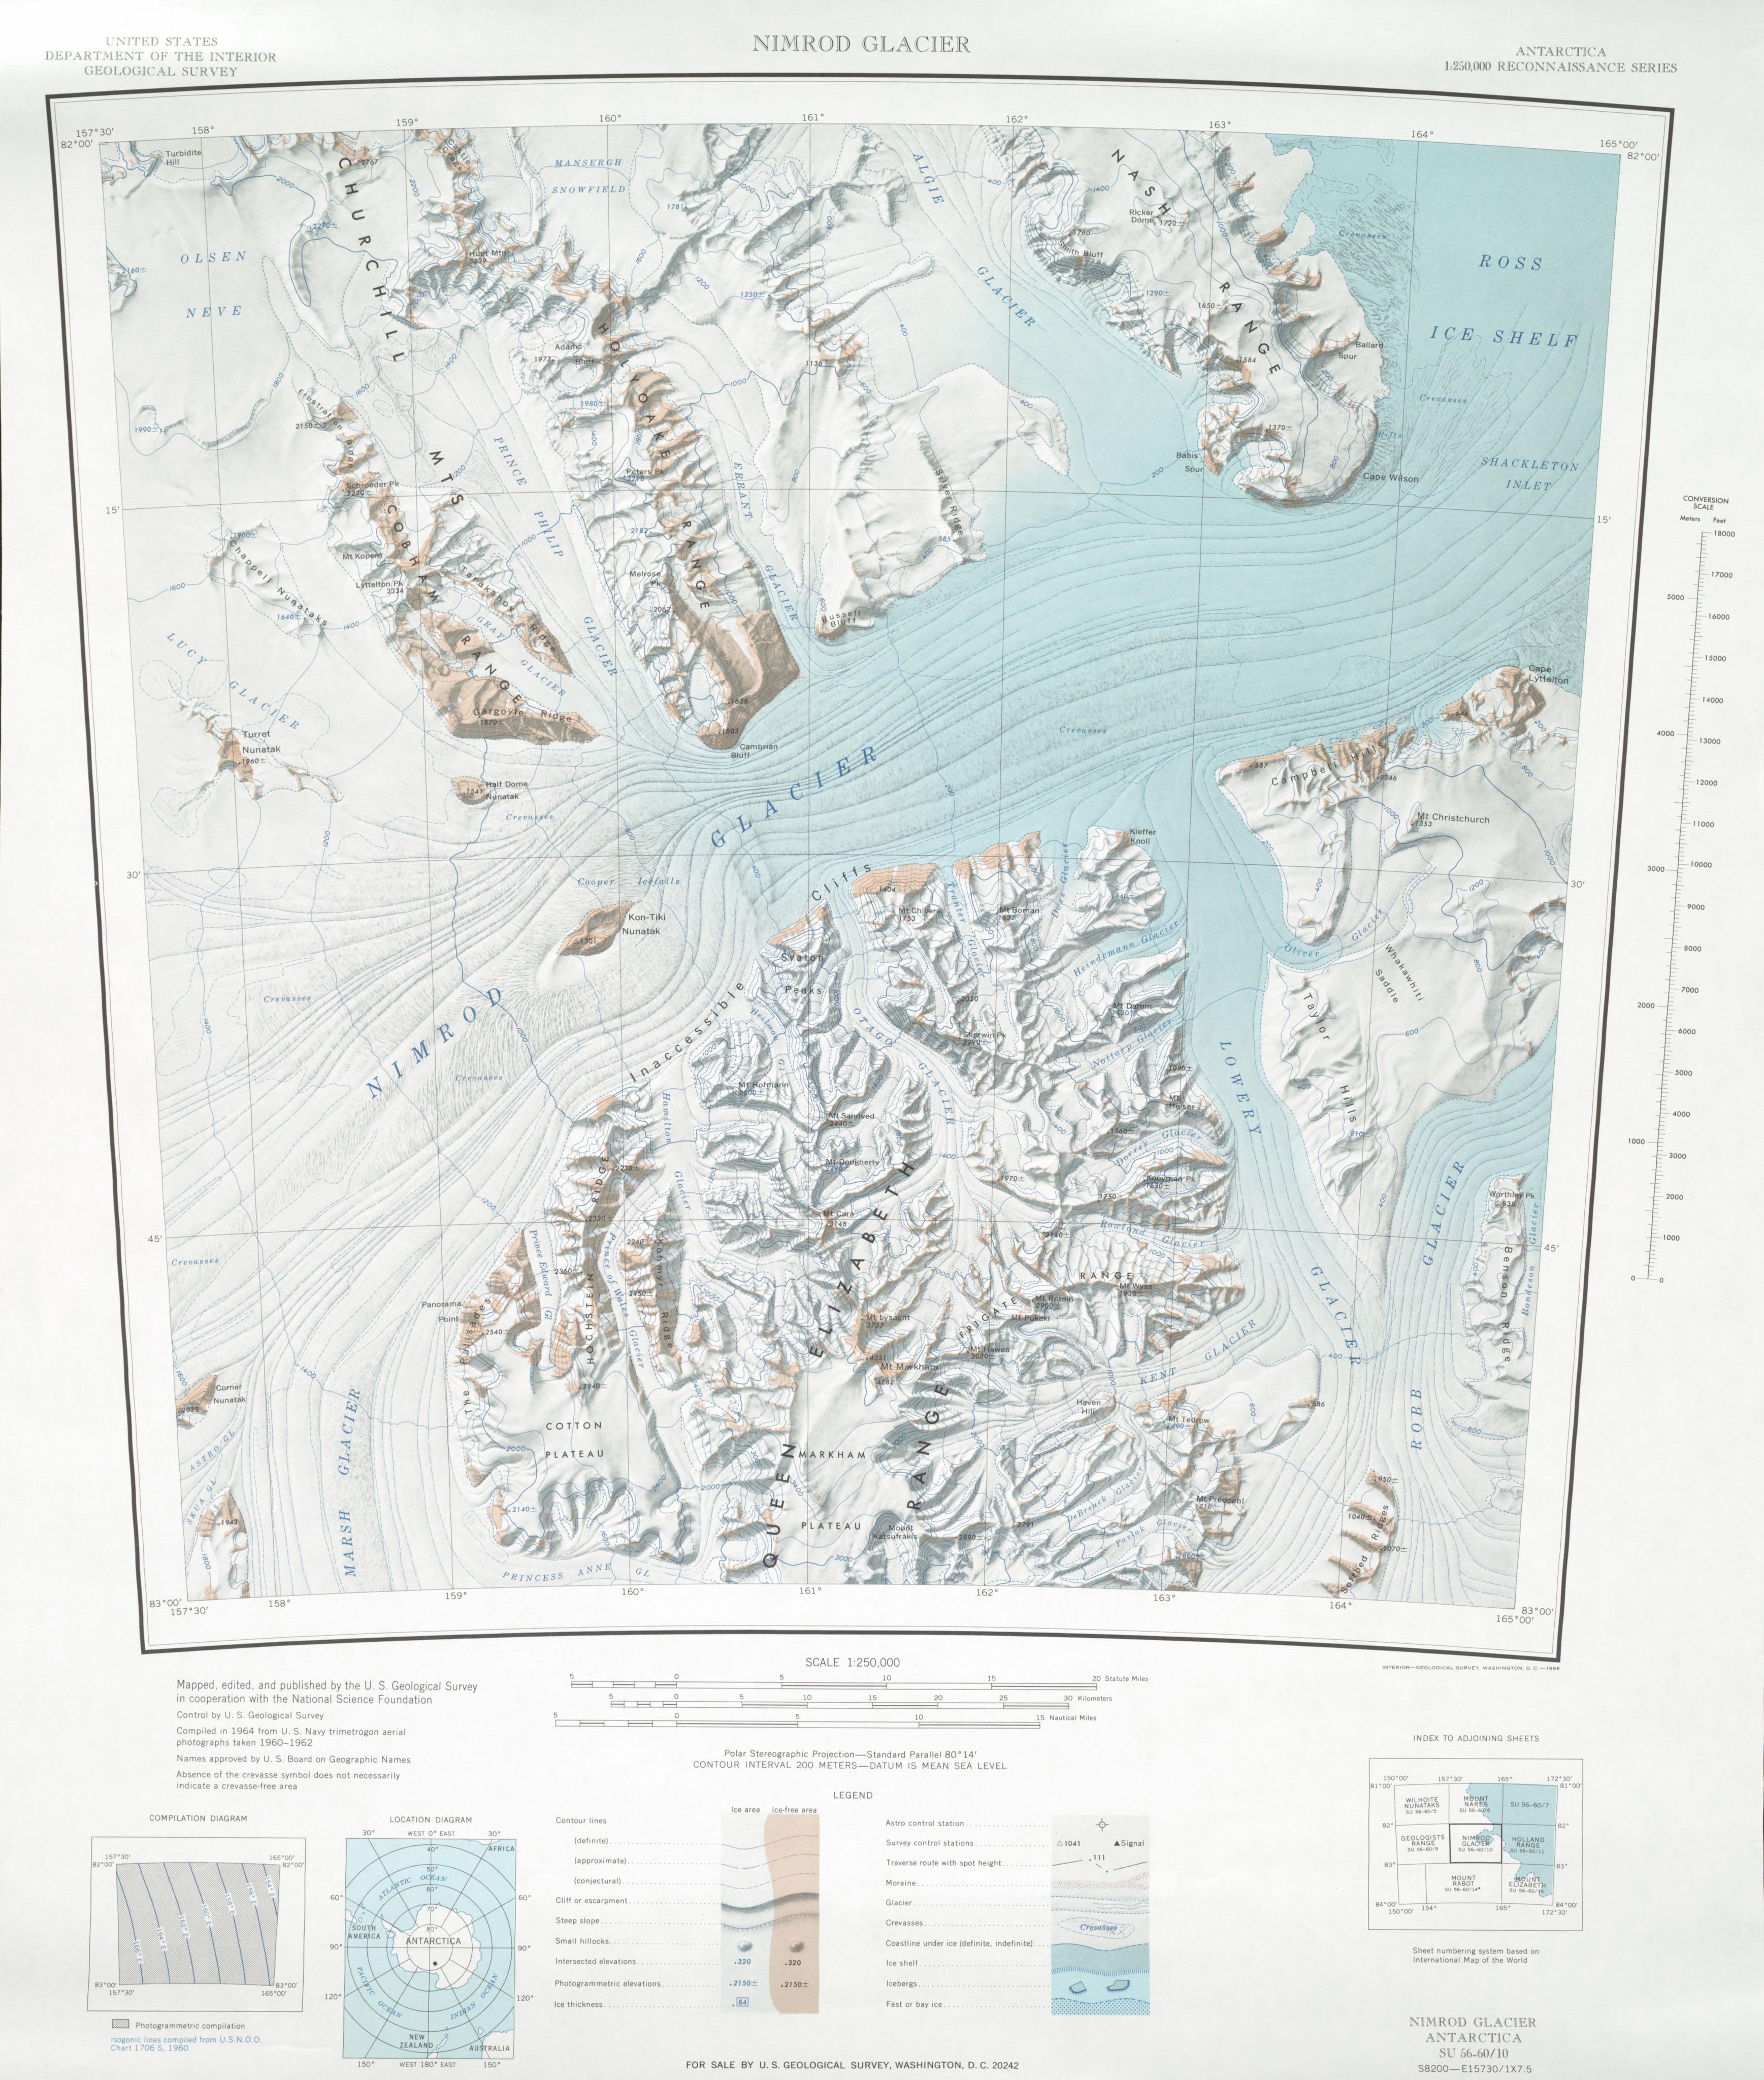 nimrod glacier